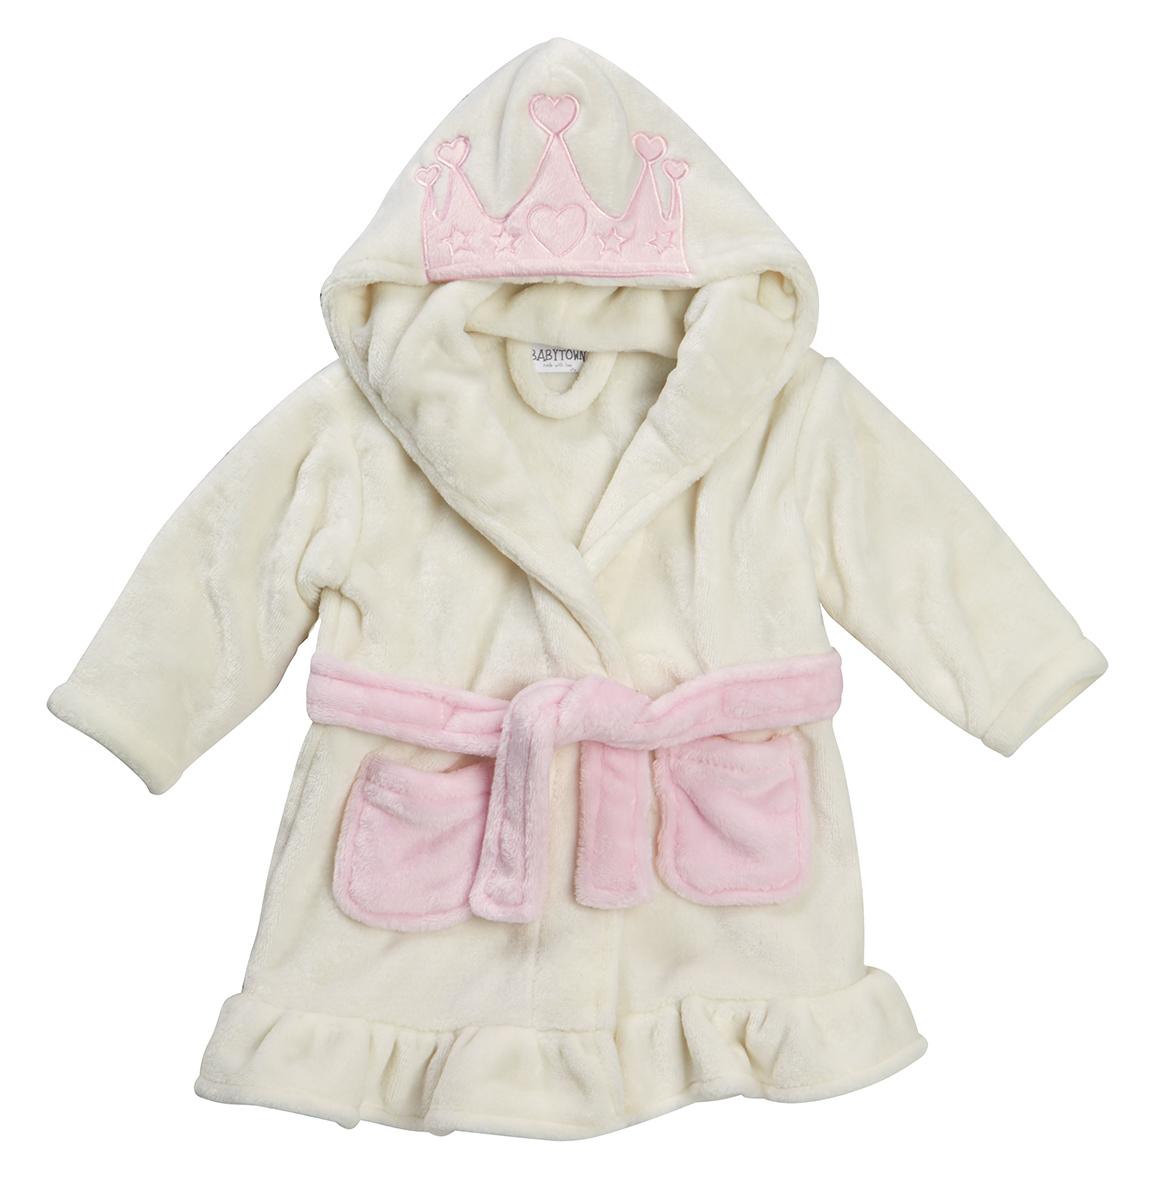 BABYTOWN Infant Baby Girls Fleece Night Gown Hooded Princess Bath ...